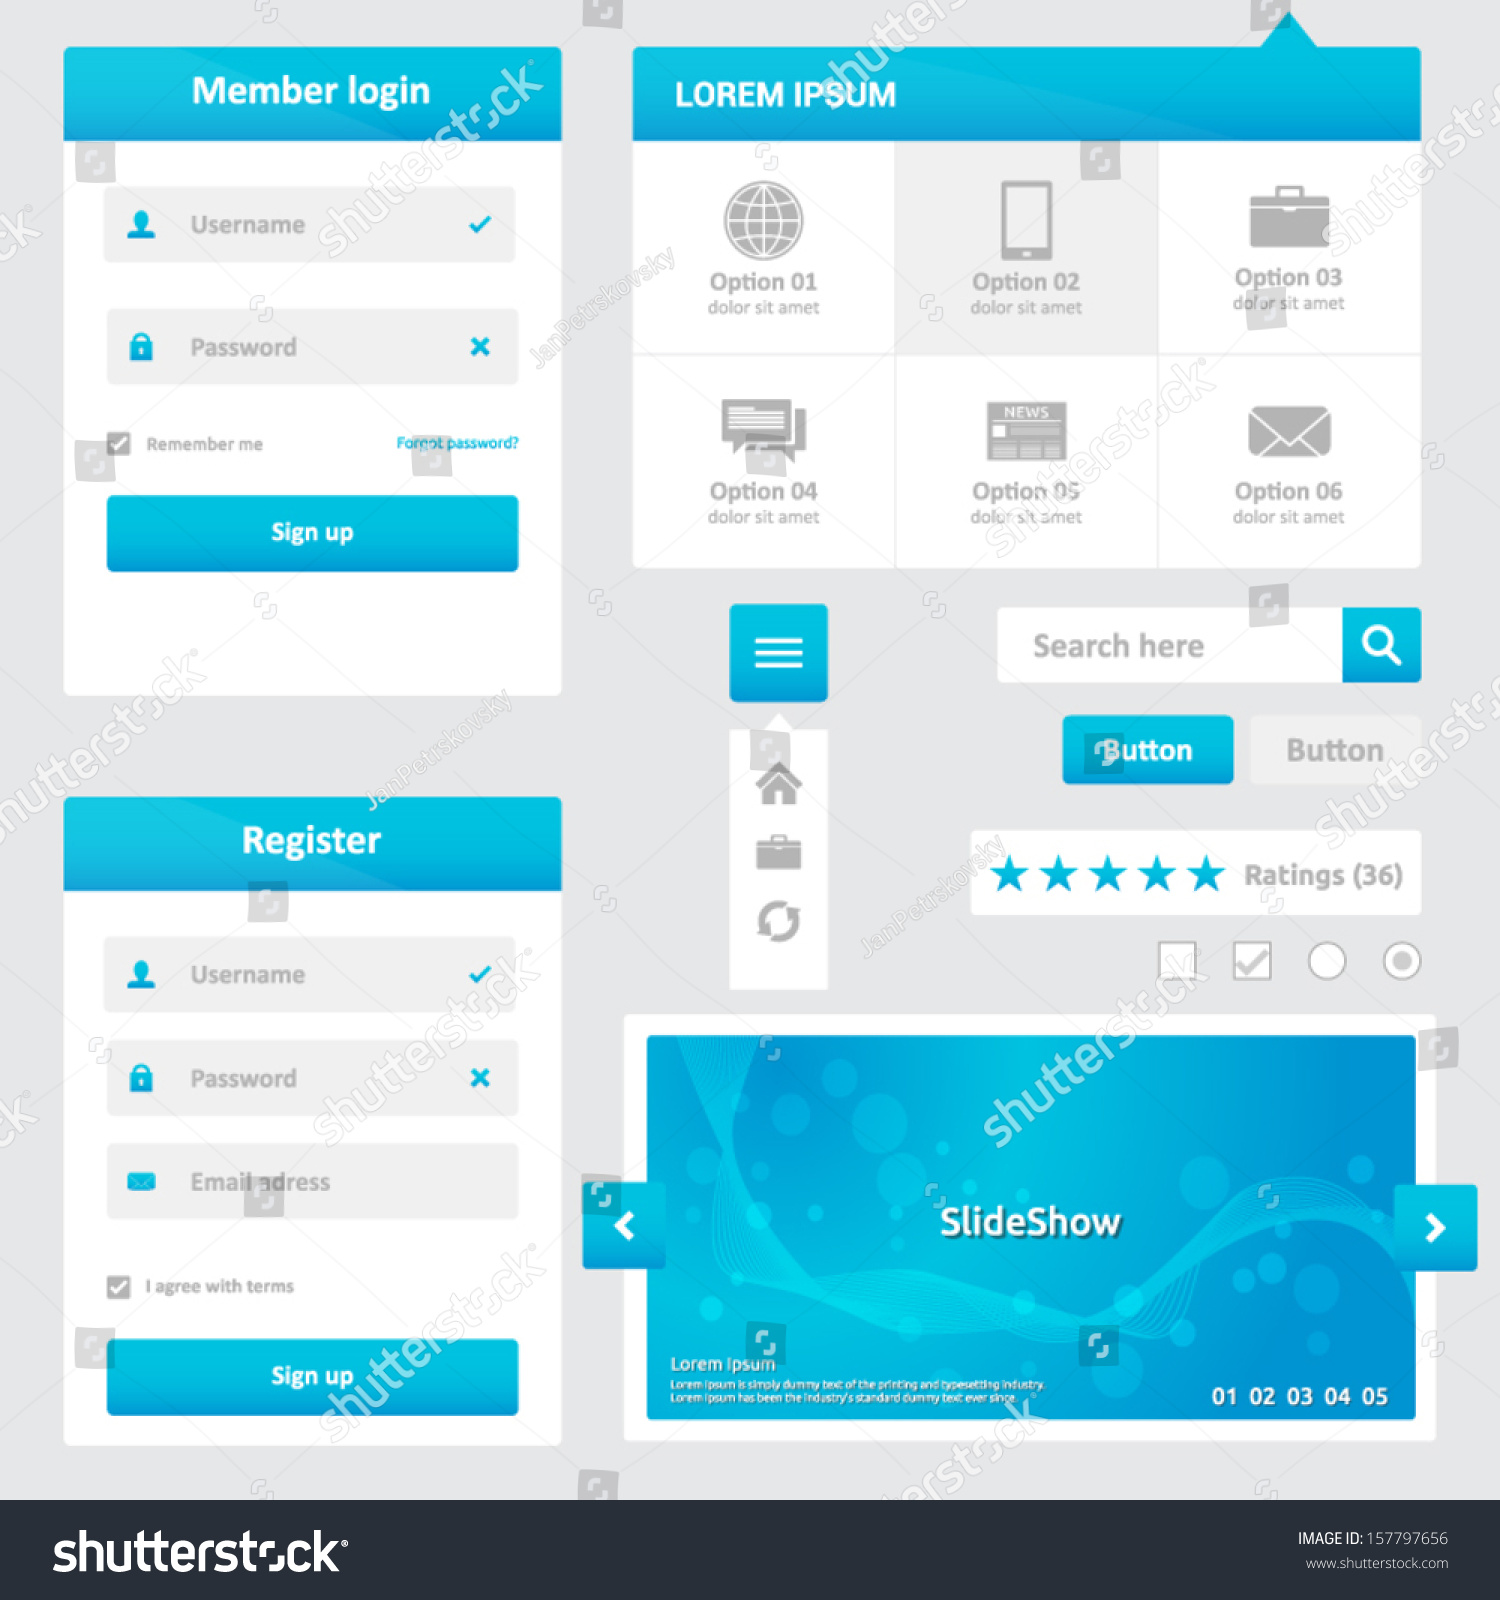 website elements design template for your web page blue and white color member login. Black Bedroom Furniture Sets. Home Design Ideas